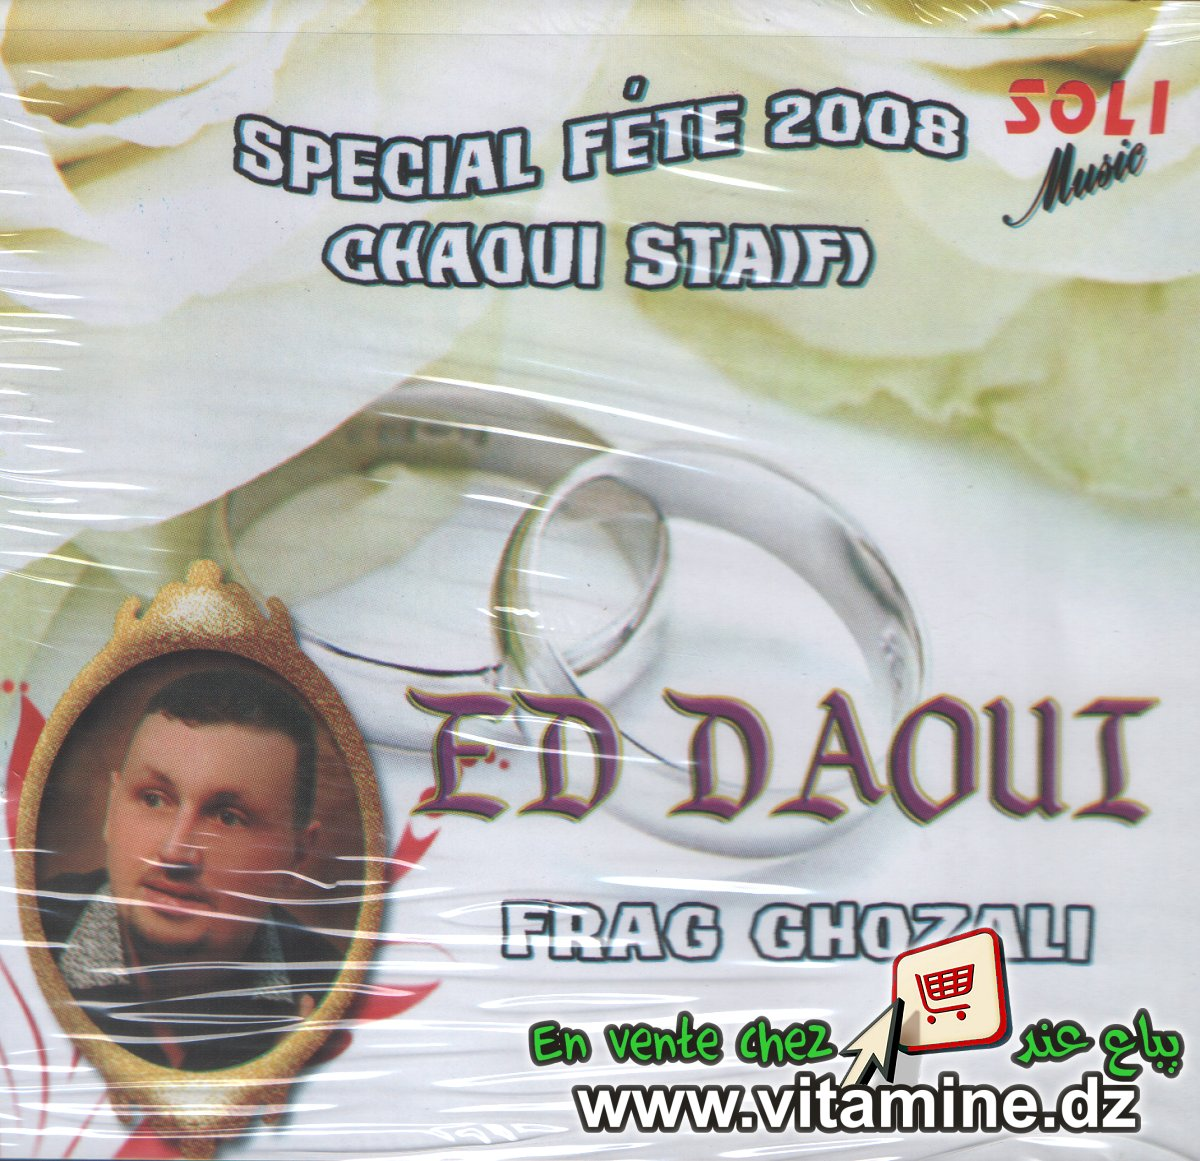 Ed Daoui - Frag Ghozali (Chaoui Staifi)